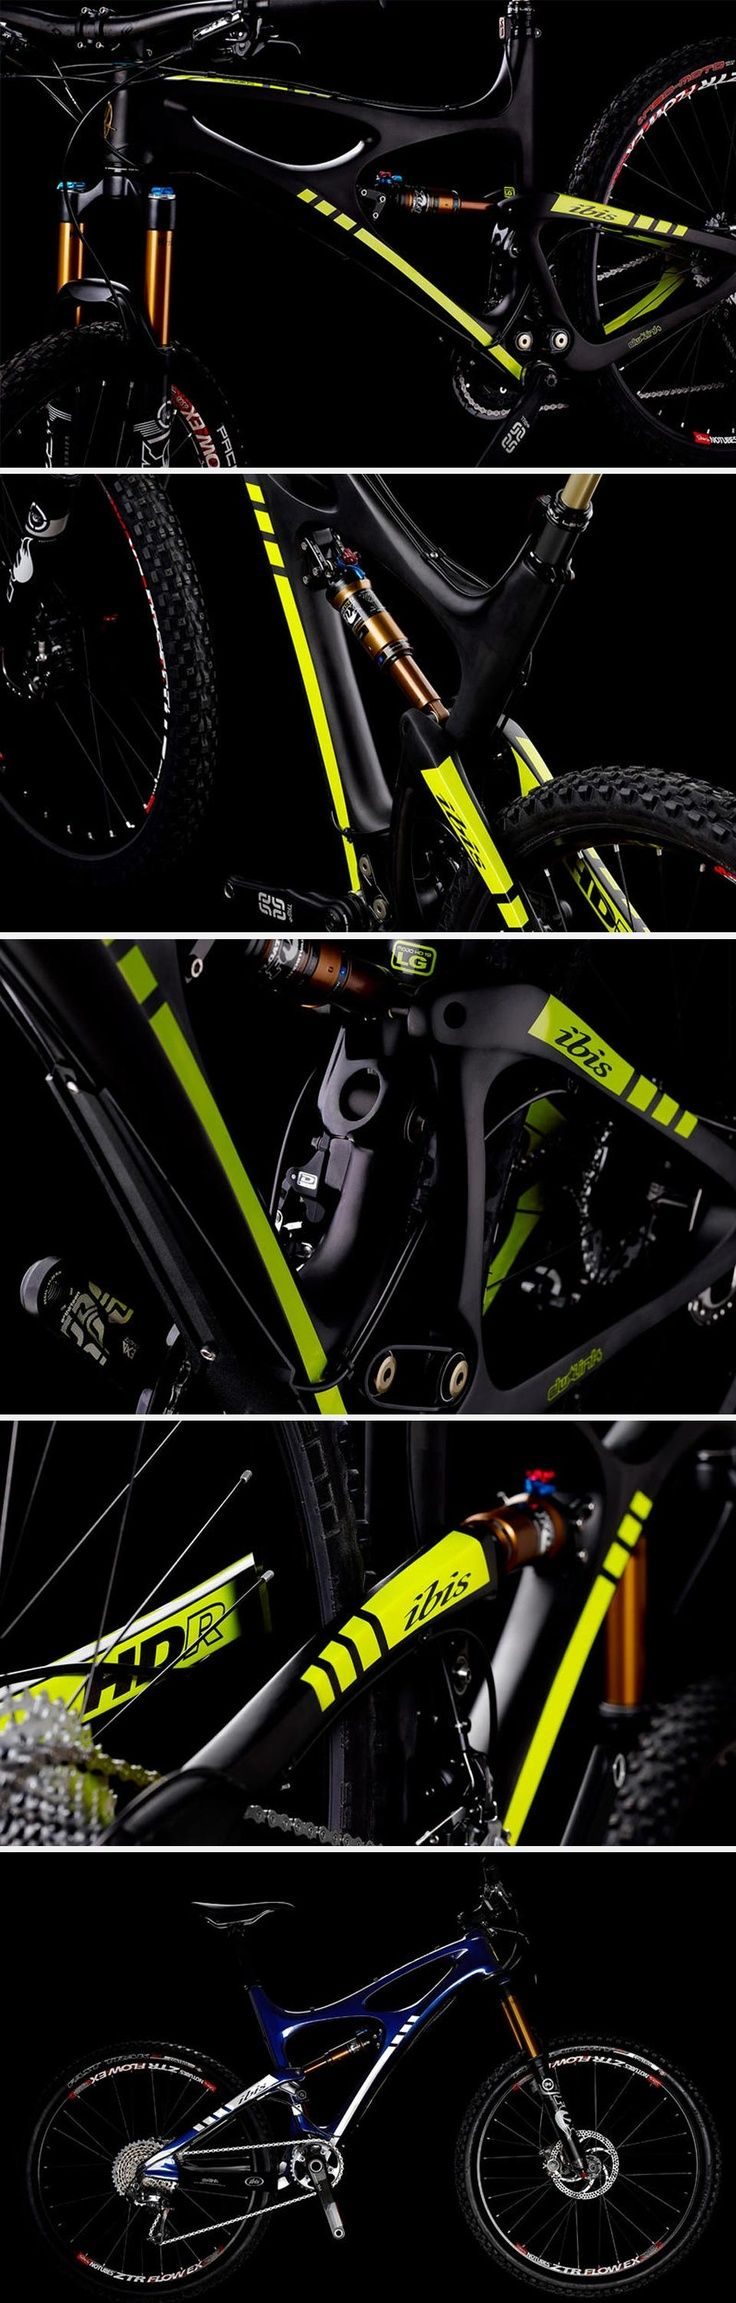 Ibis Mojo HDR mountain bike